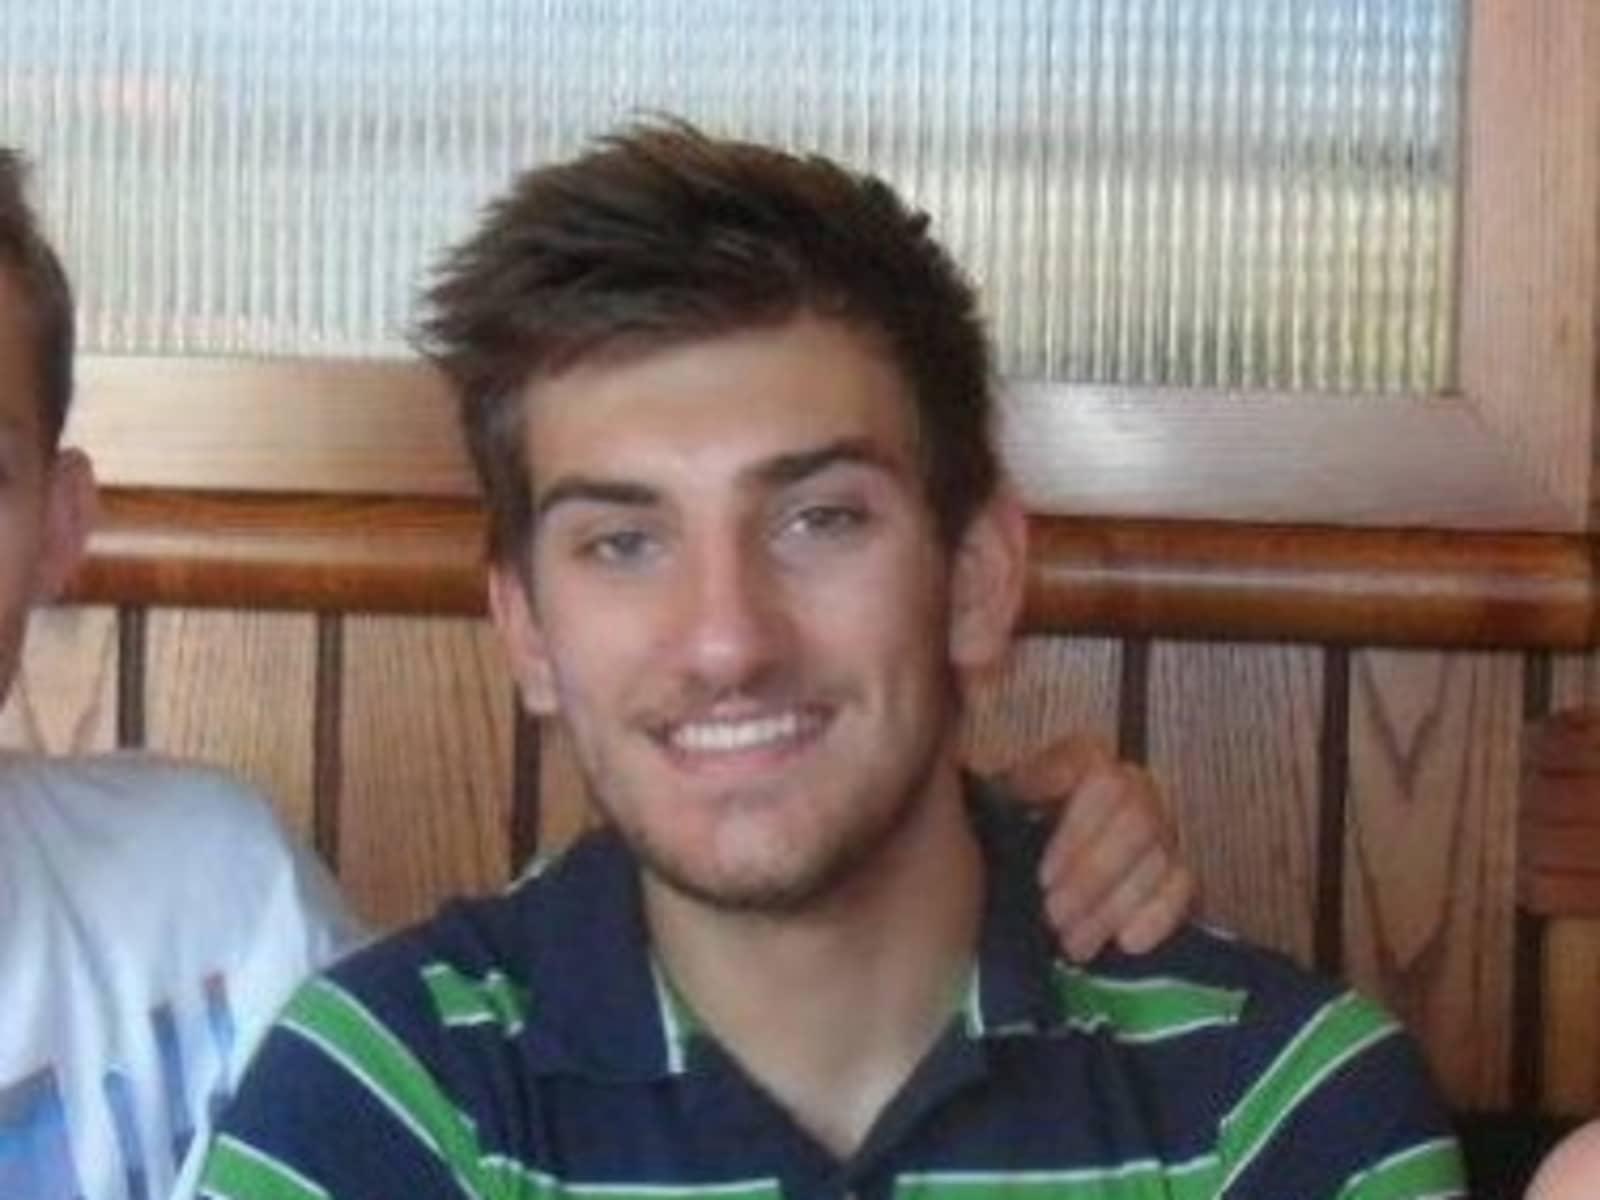 John from Exeter, United Kingdom